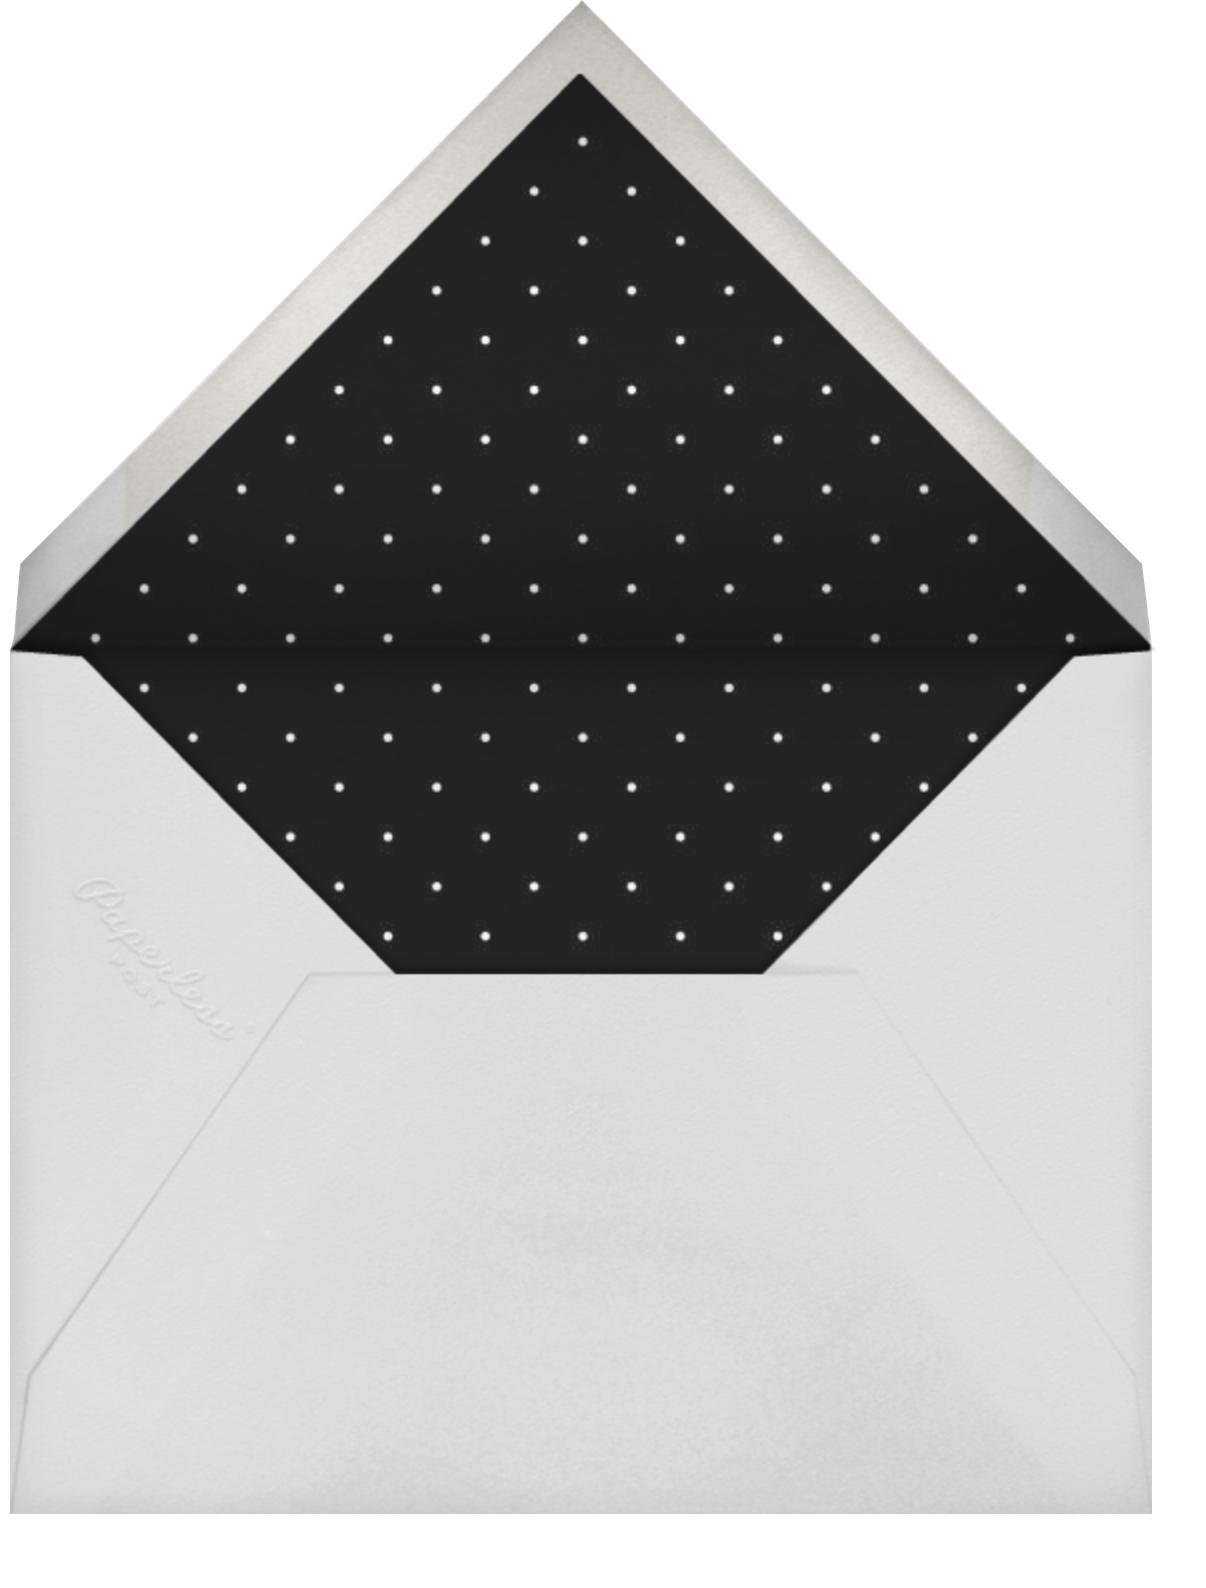 Whitework - Gold - Paperless Post - Envelope